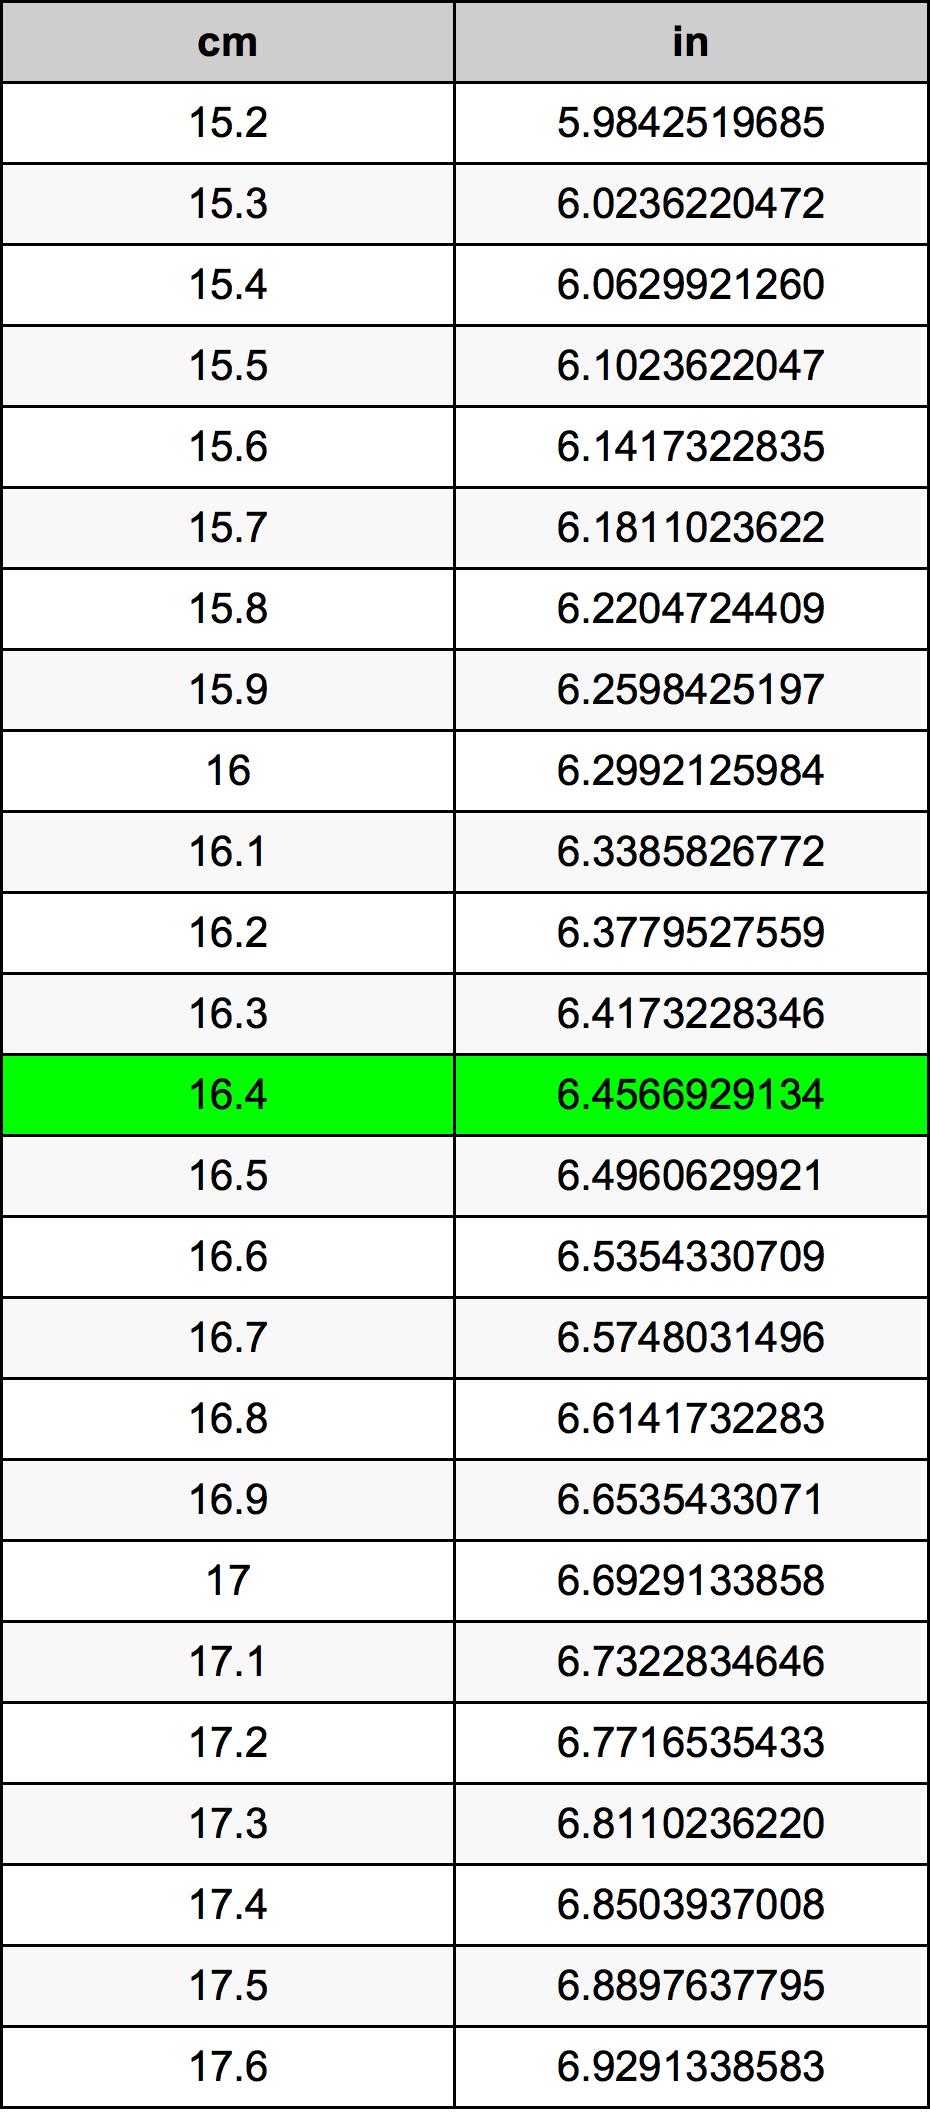 16.4 Centimeter Table